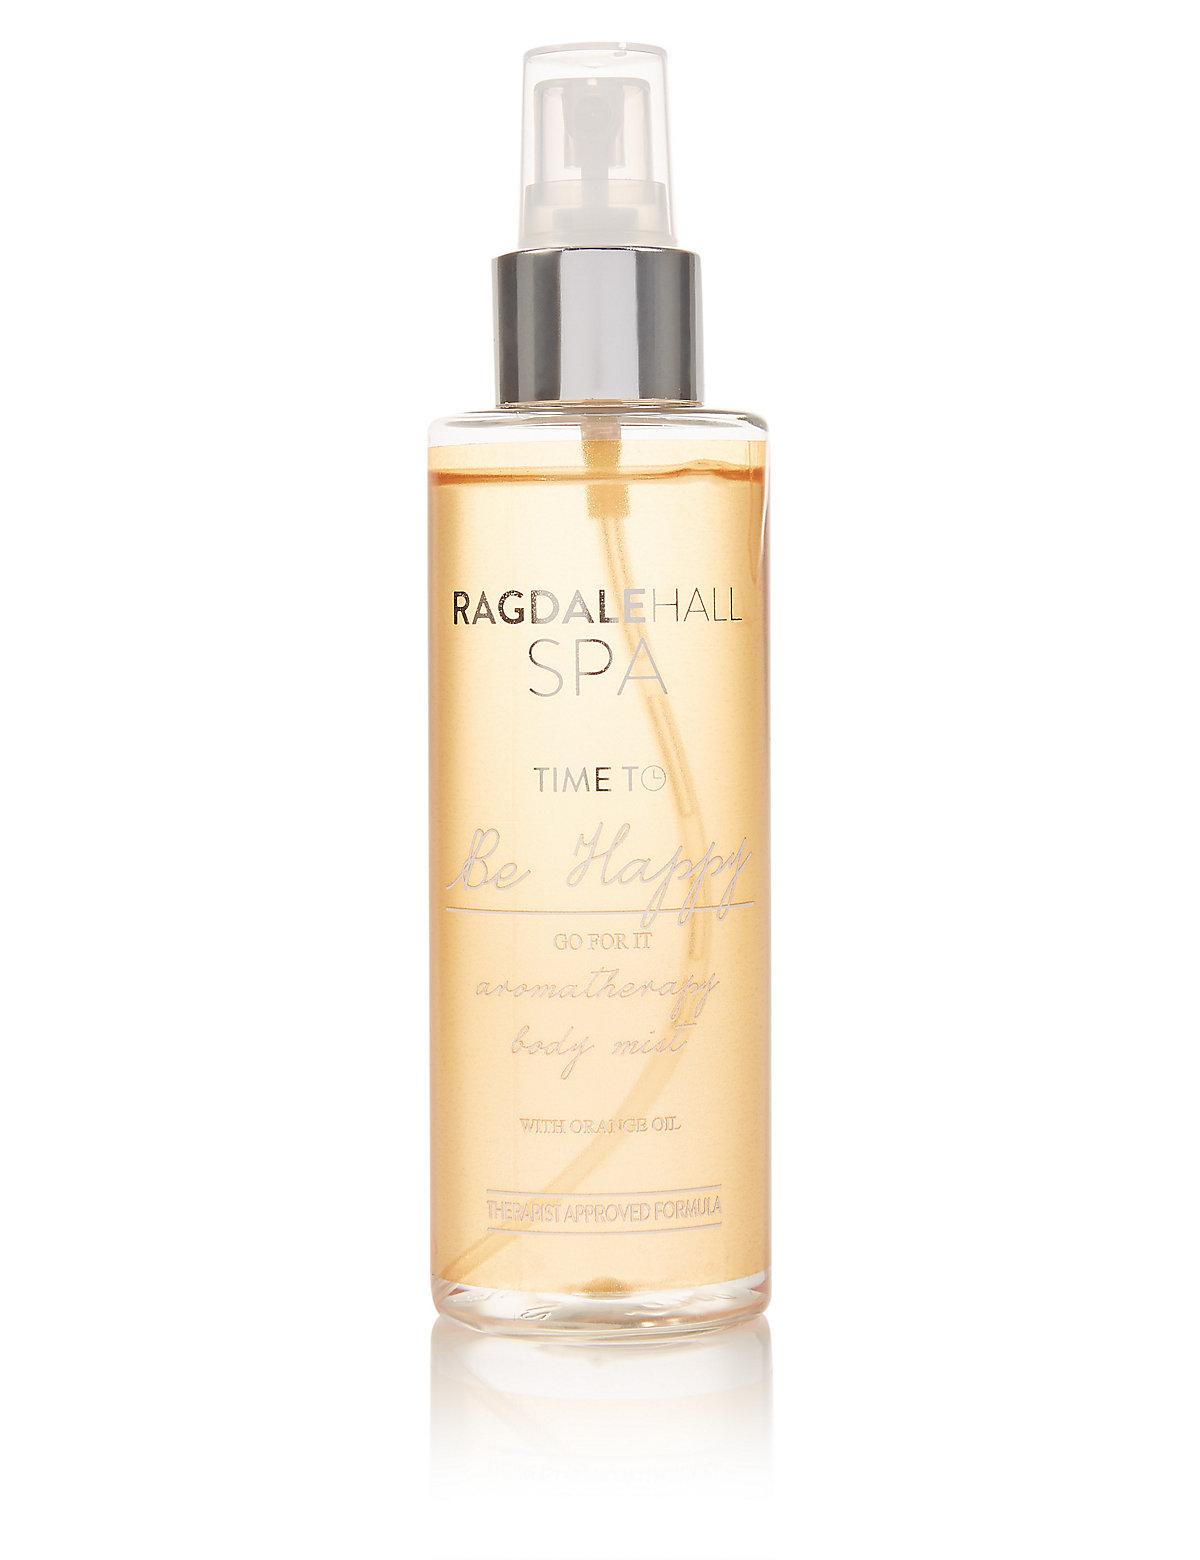 Ragdale Hall Be Happy Aromatherapy Body Mist 150ml